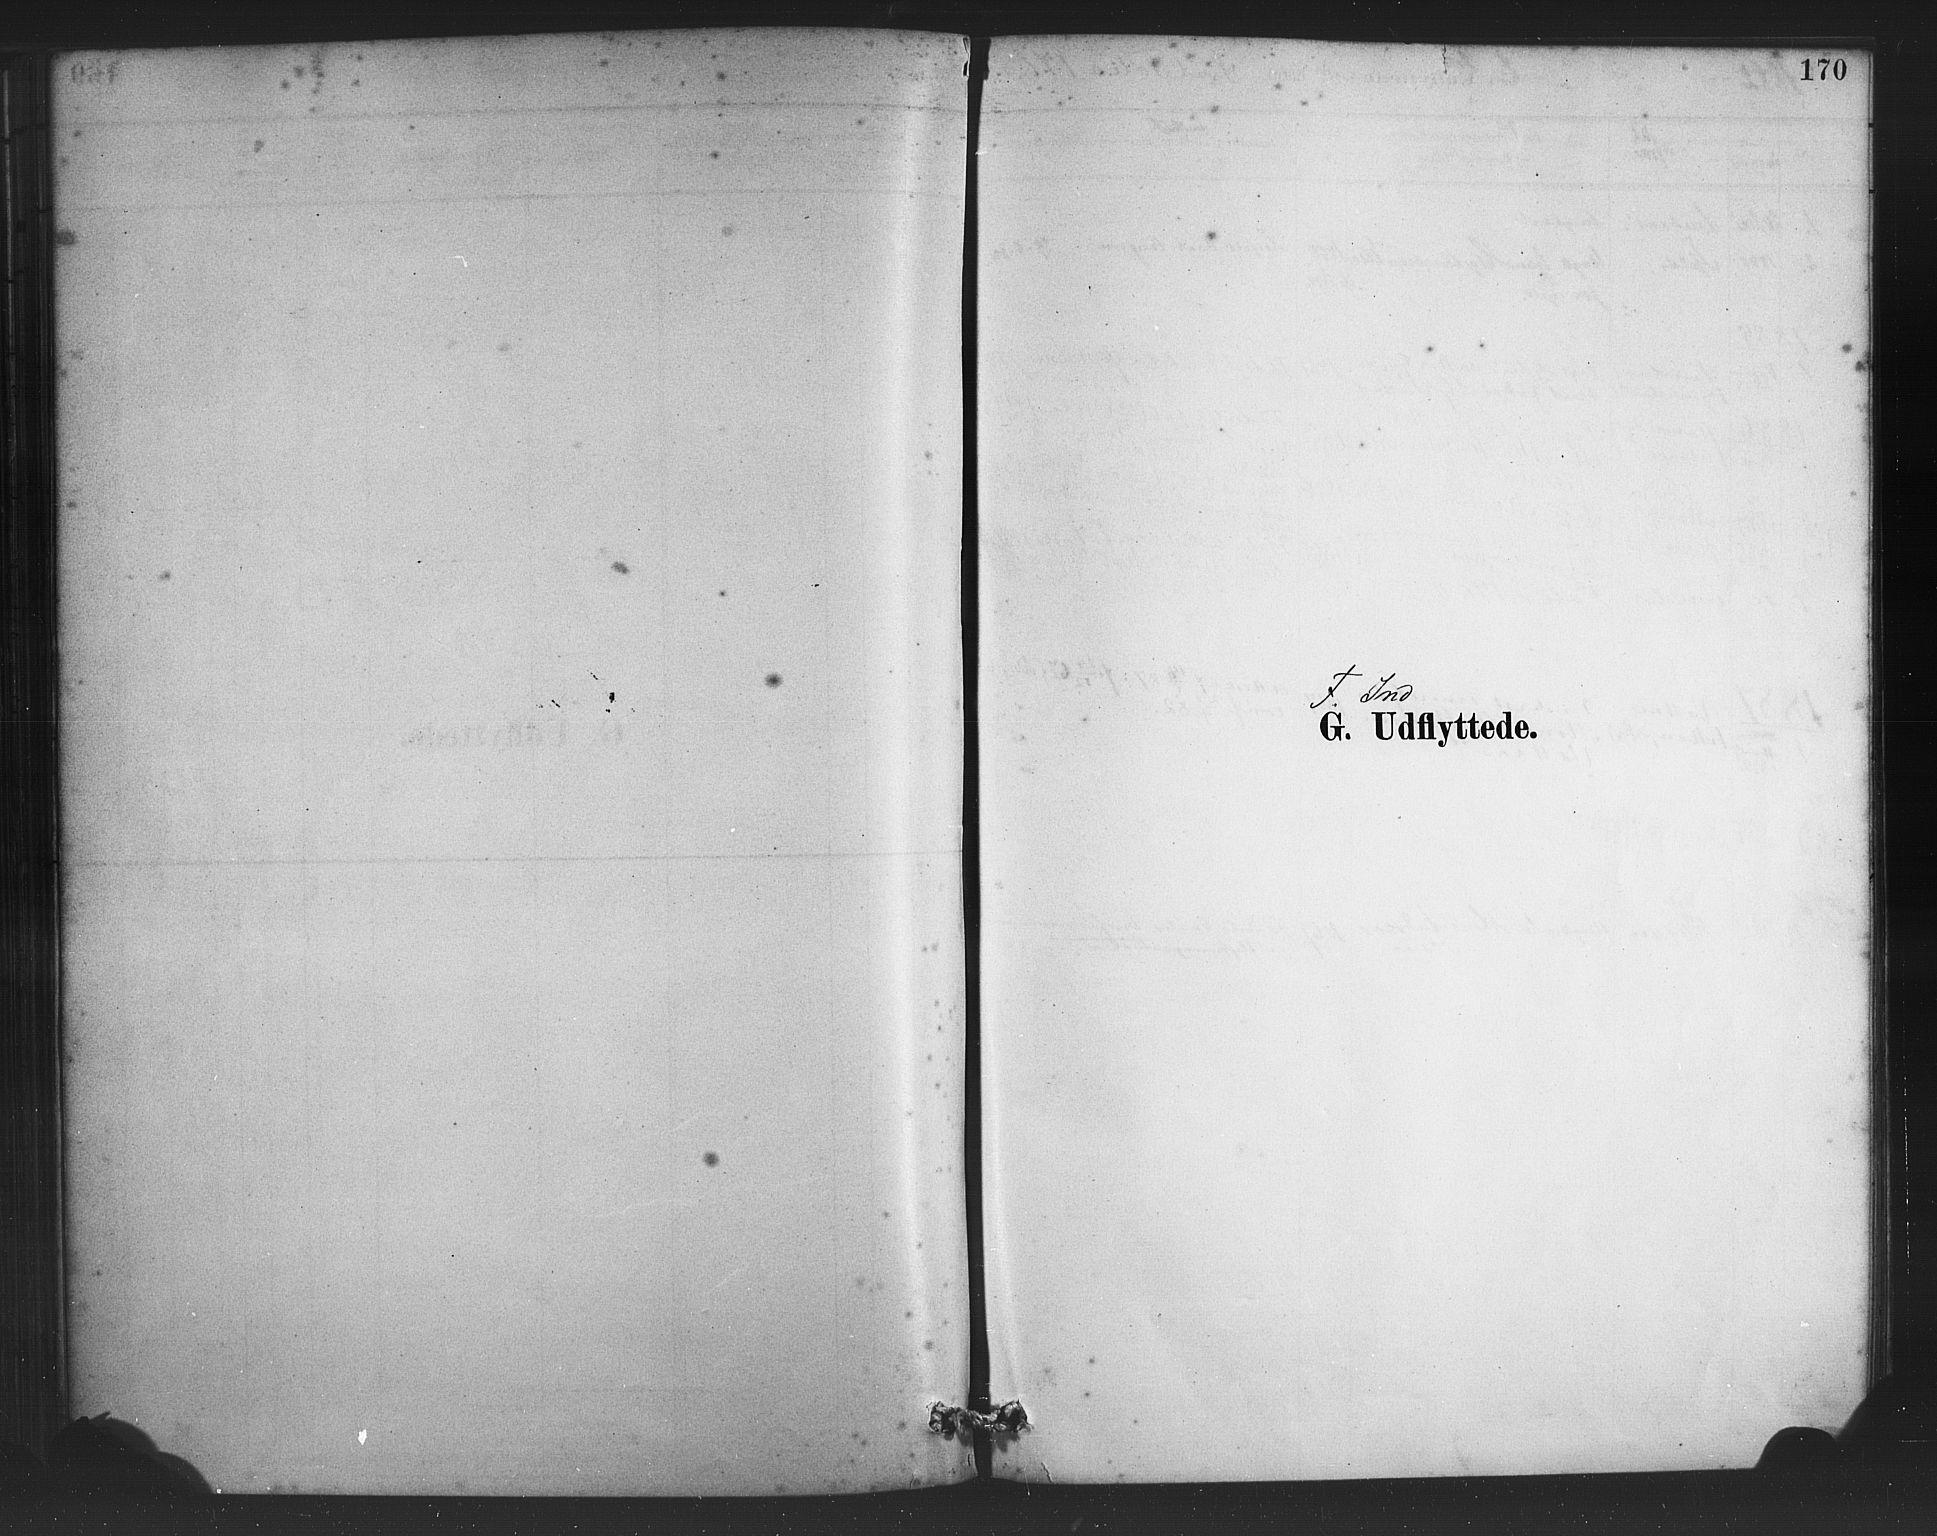 SAB, Alversund Sokneprestembete, H/Ha/Haa/Haac/L0001: Ministerialbok nr. C 1, 1882-1900, s. 170